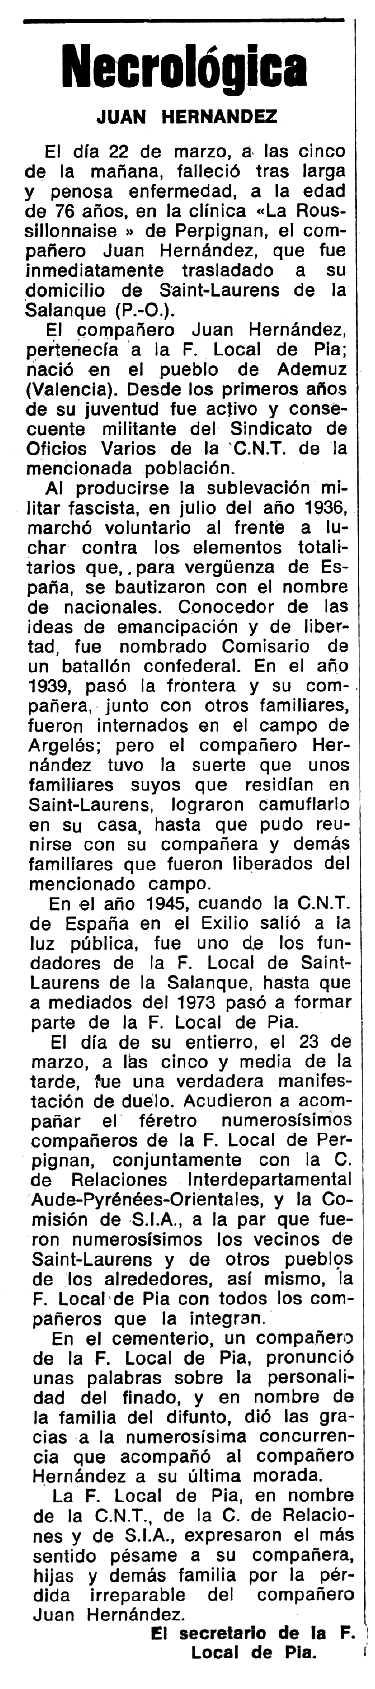 "Necrològica de Juan Hernández publicada en el periòdic tolosà ""Espoir"" del 4 d'agost de 1974"